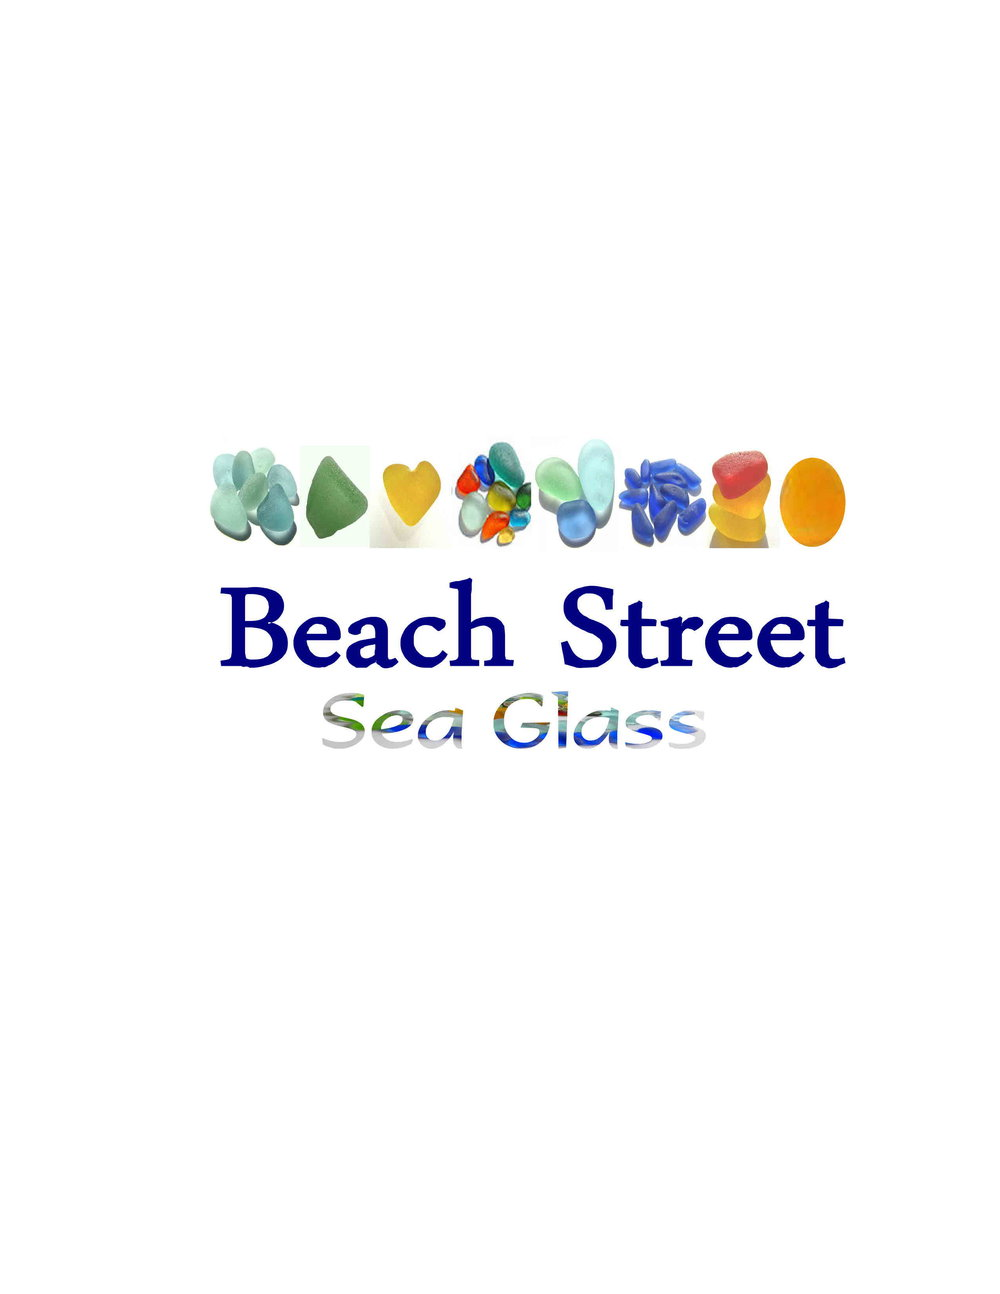 Beach Street Sea Glass